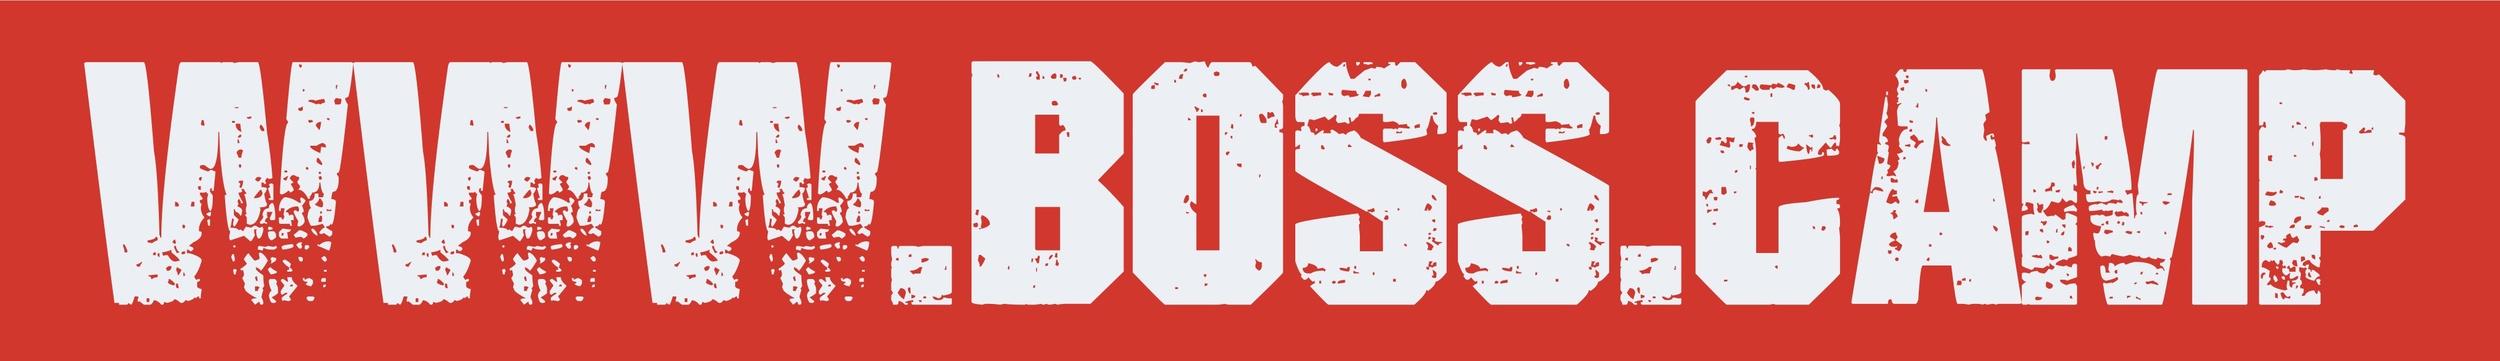 Be a better boss with www.boss.camp jpeg